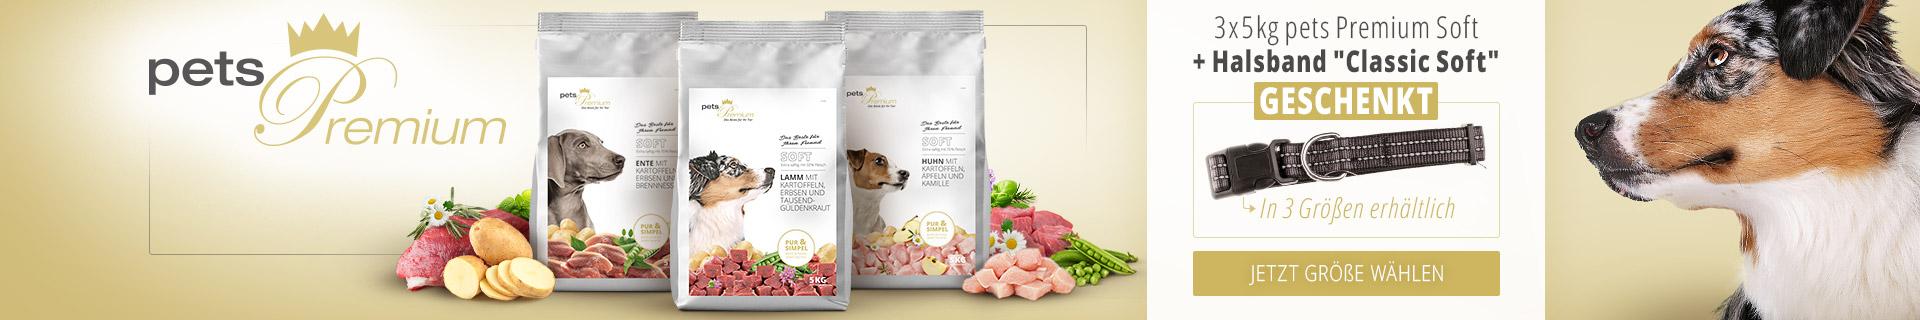 pets Premium Soft Hundefutter Aktion mit Classic Soft Halsband Geschenkt